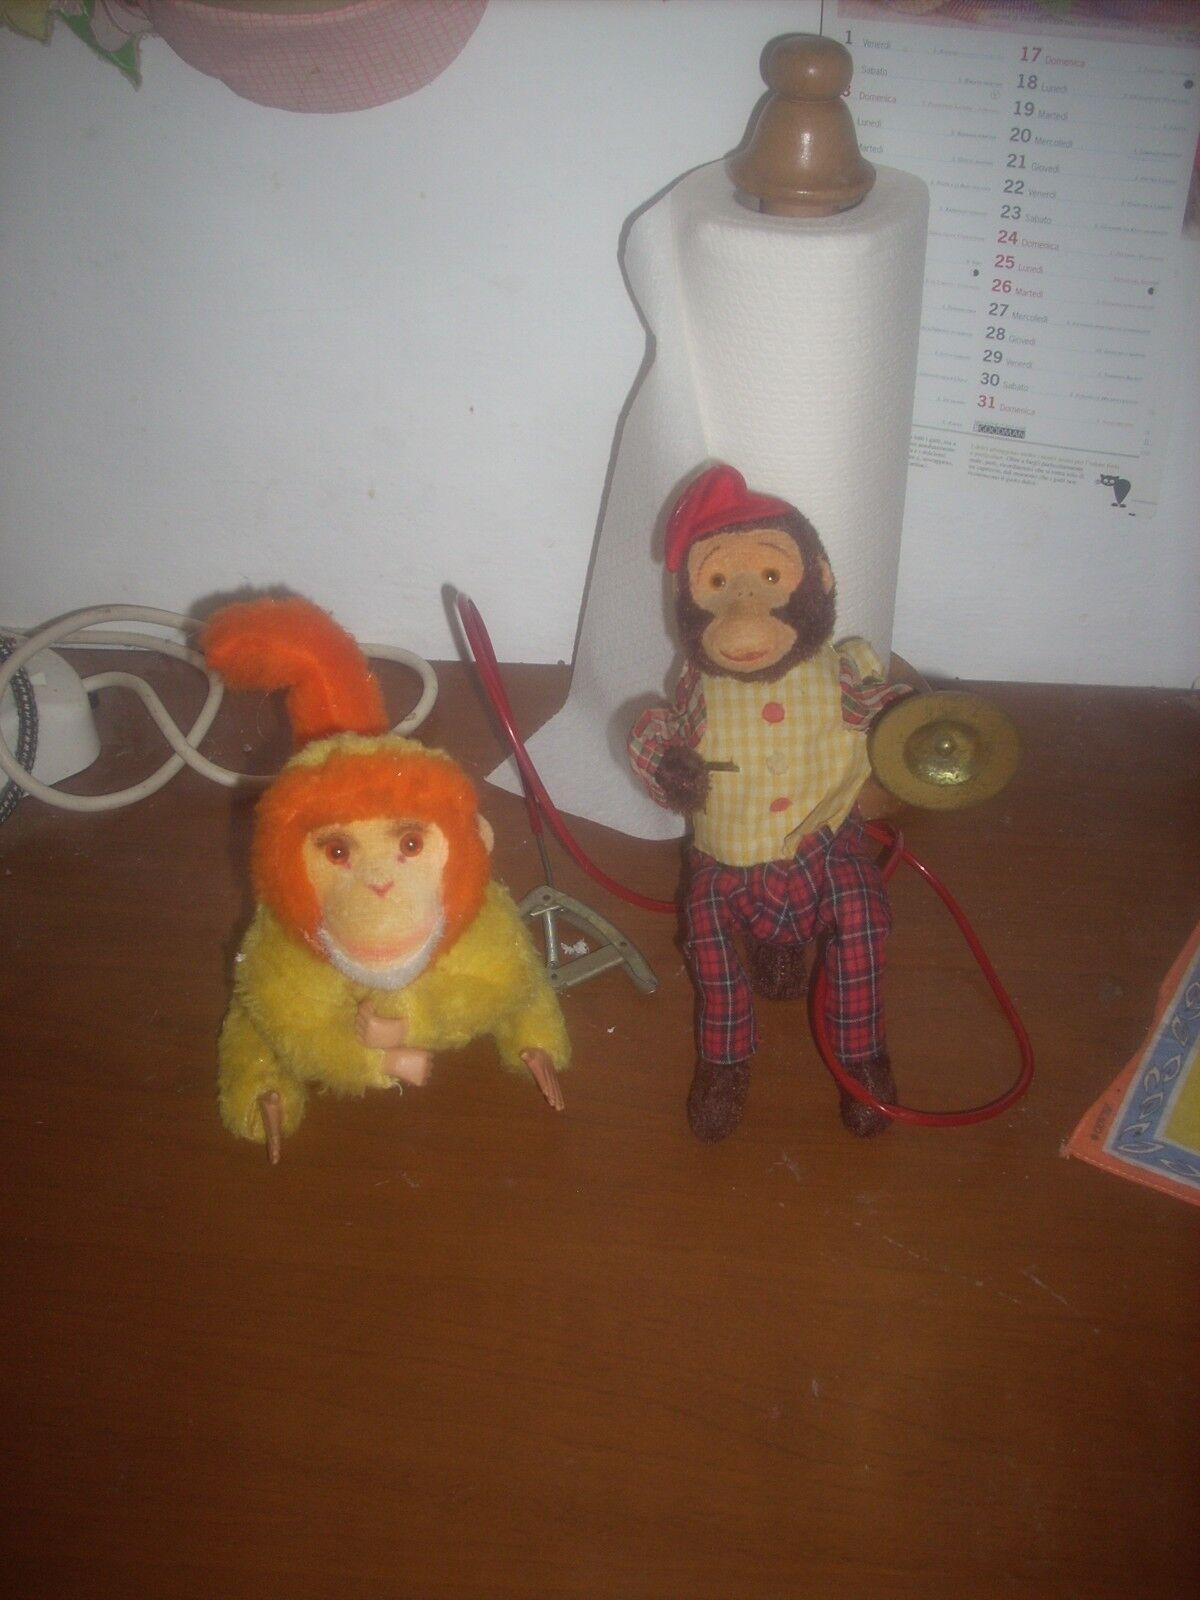 2 scimmiette  pupazzi vintage  1 original carl made in germany leggi....